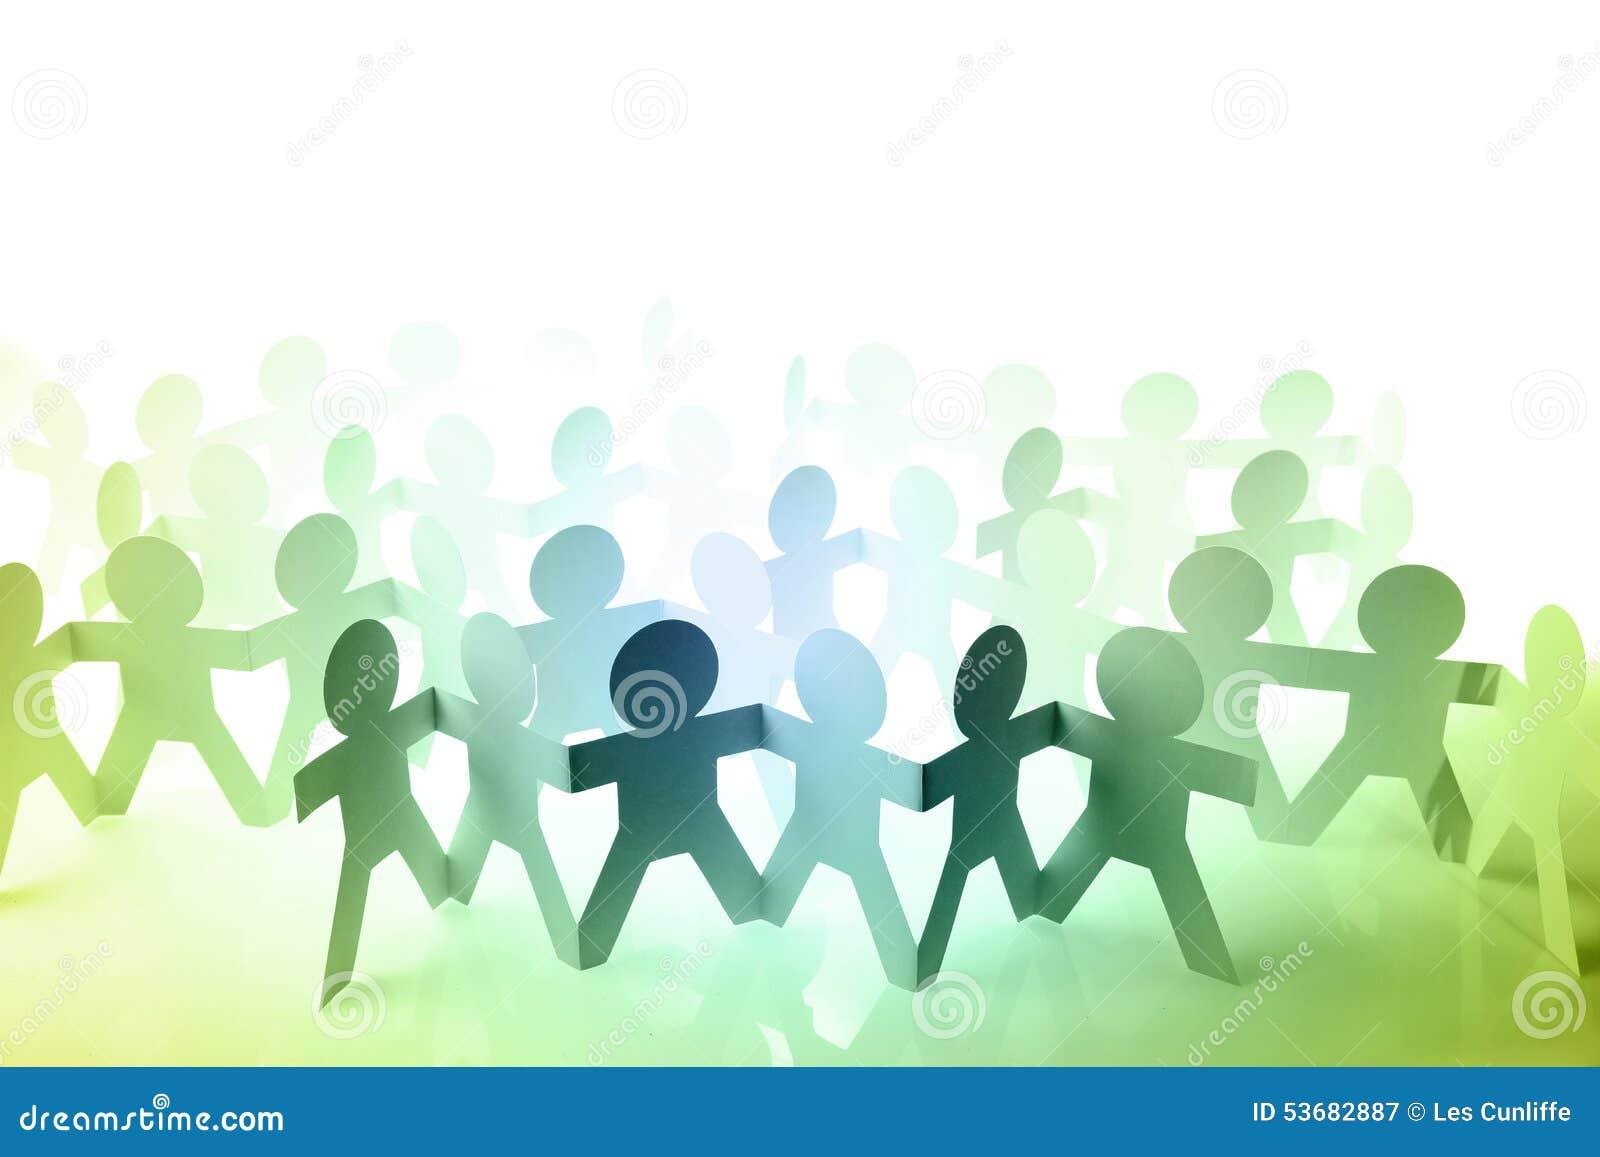 Teamwork Stock Photo - Image: 53682887